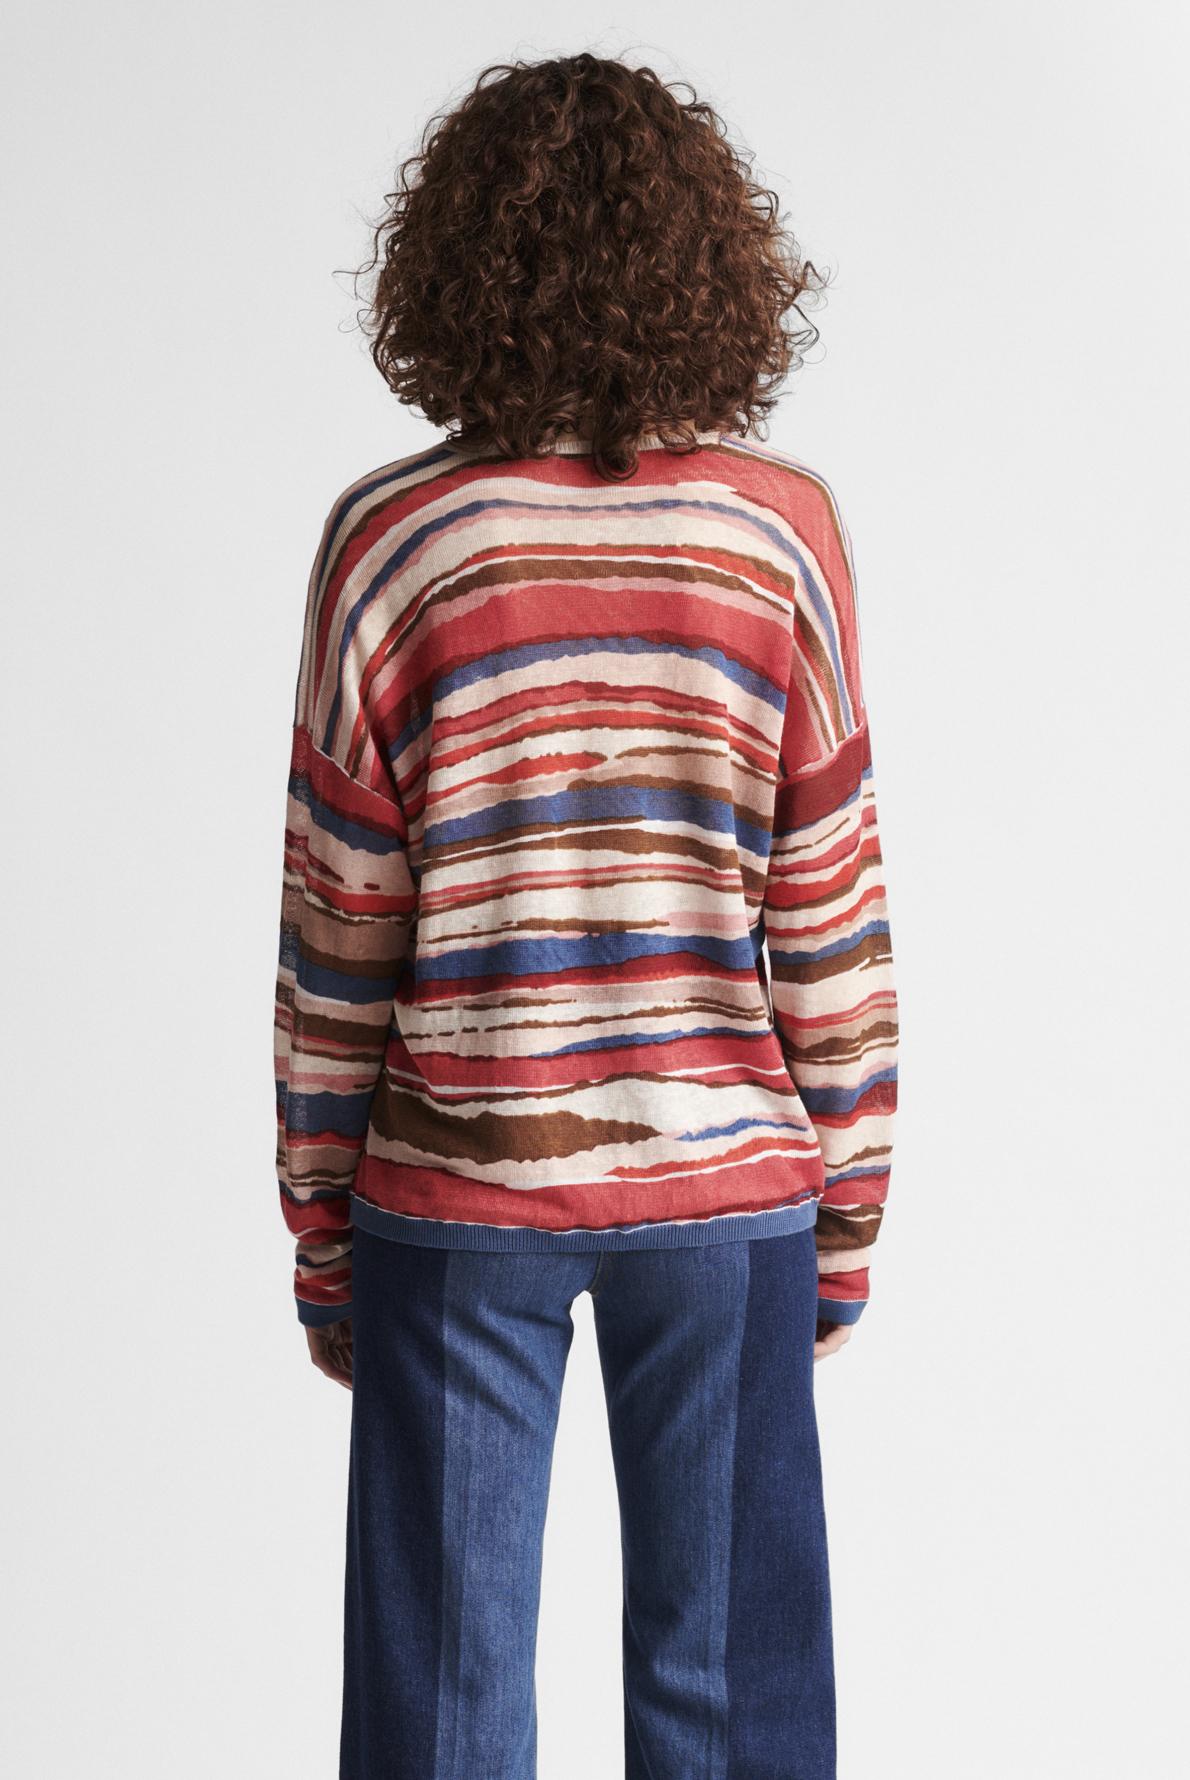 ERIKA - Пуловер - оверсайз из льна